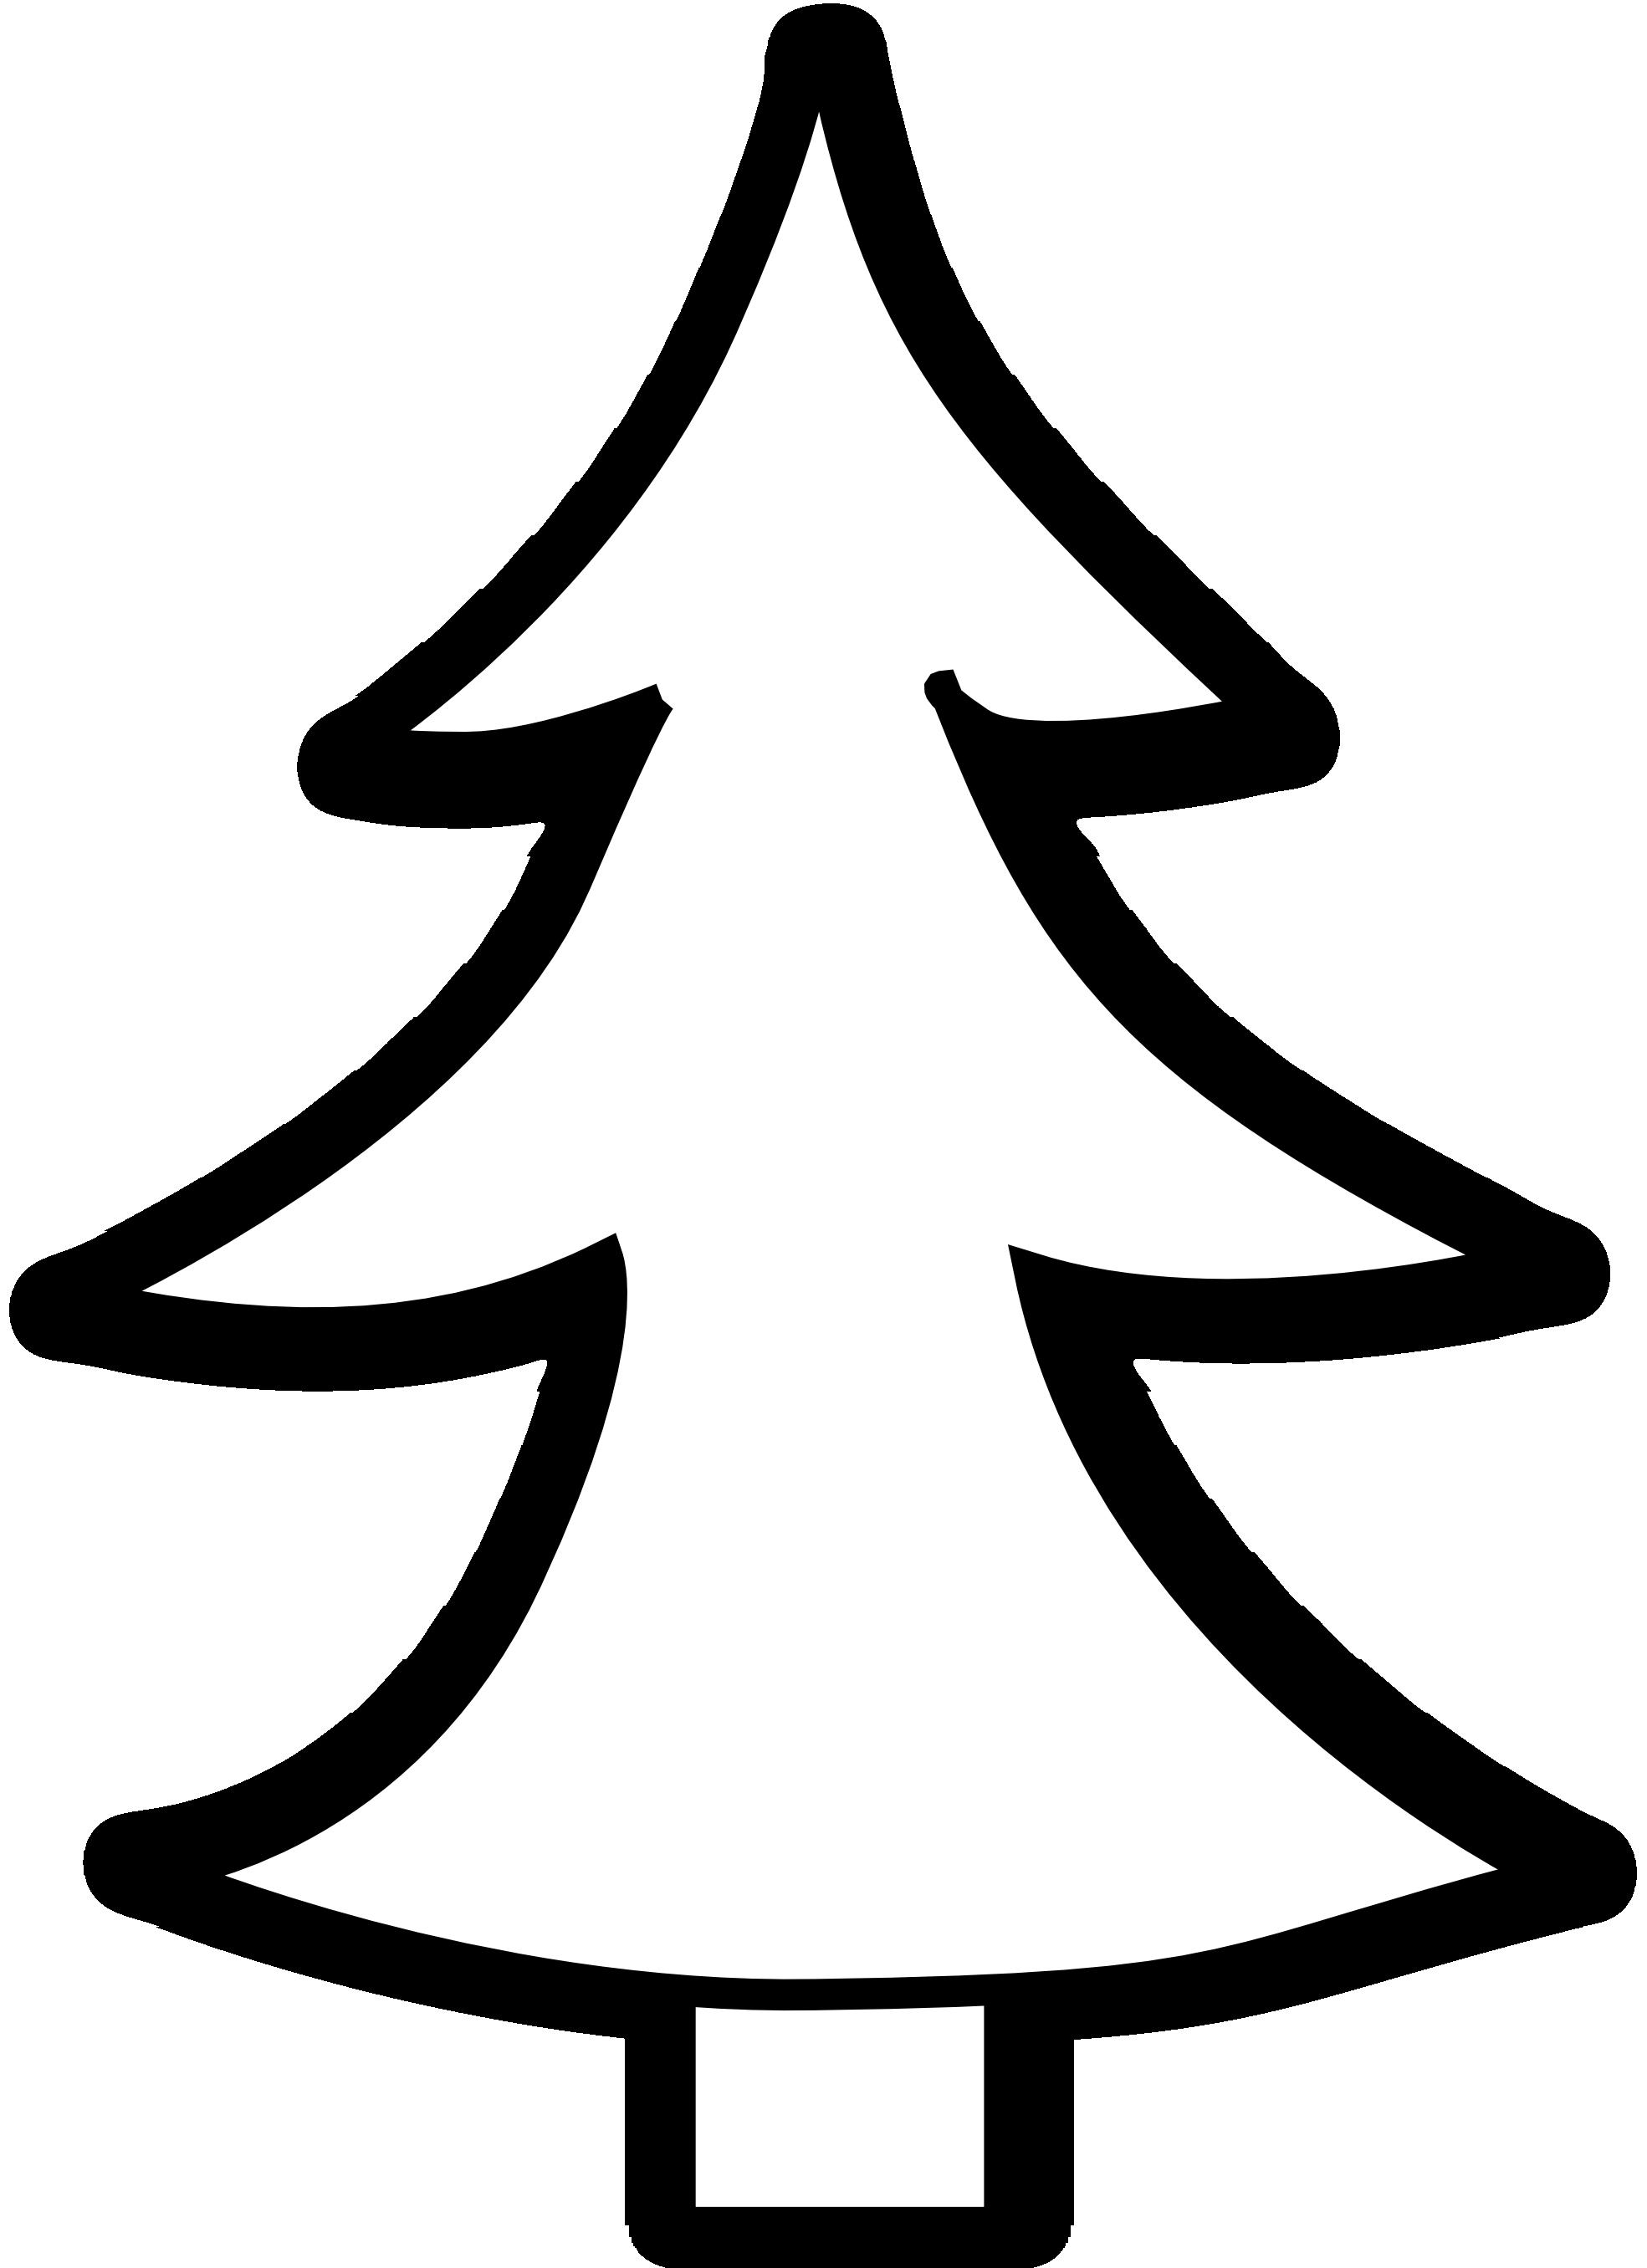 Christmas Tree Clip Art Black ... black and white tree% .